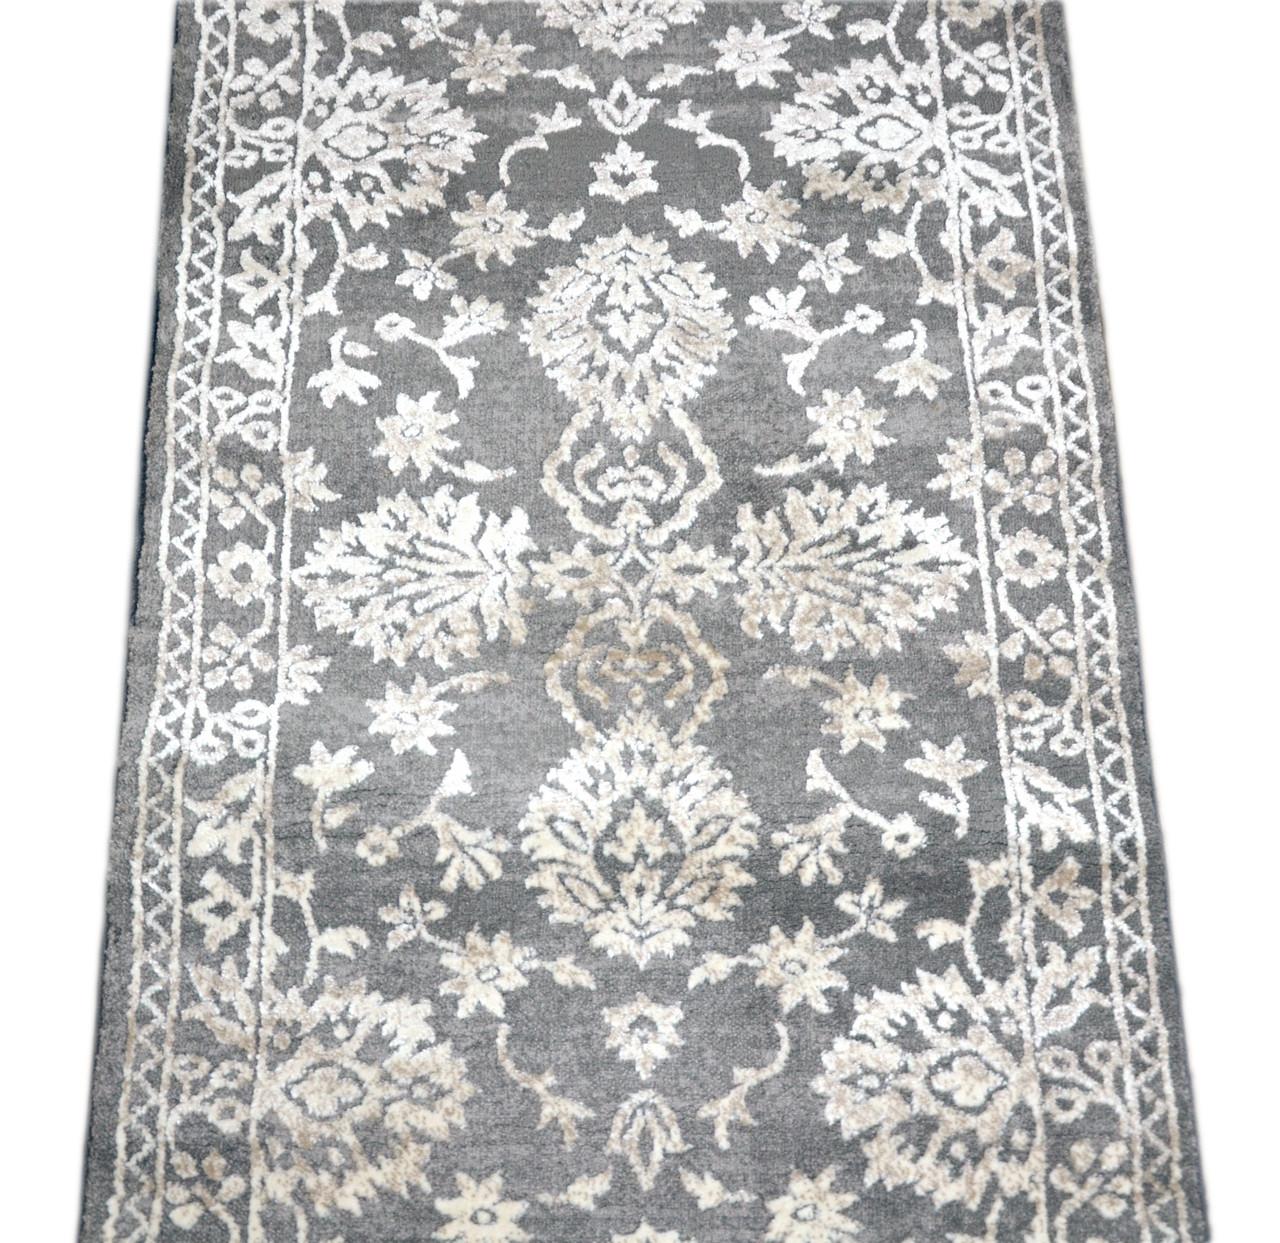 Dean Thema Anatolia Gray Carpet Rug Hallway Stair Runner